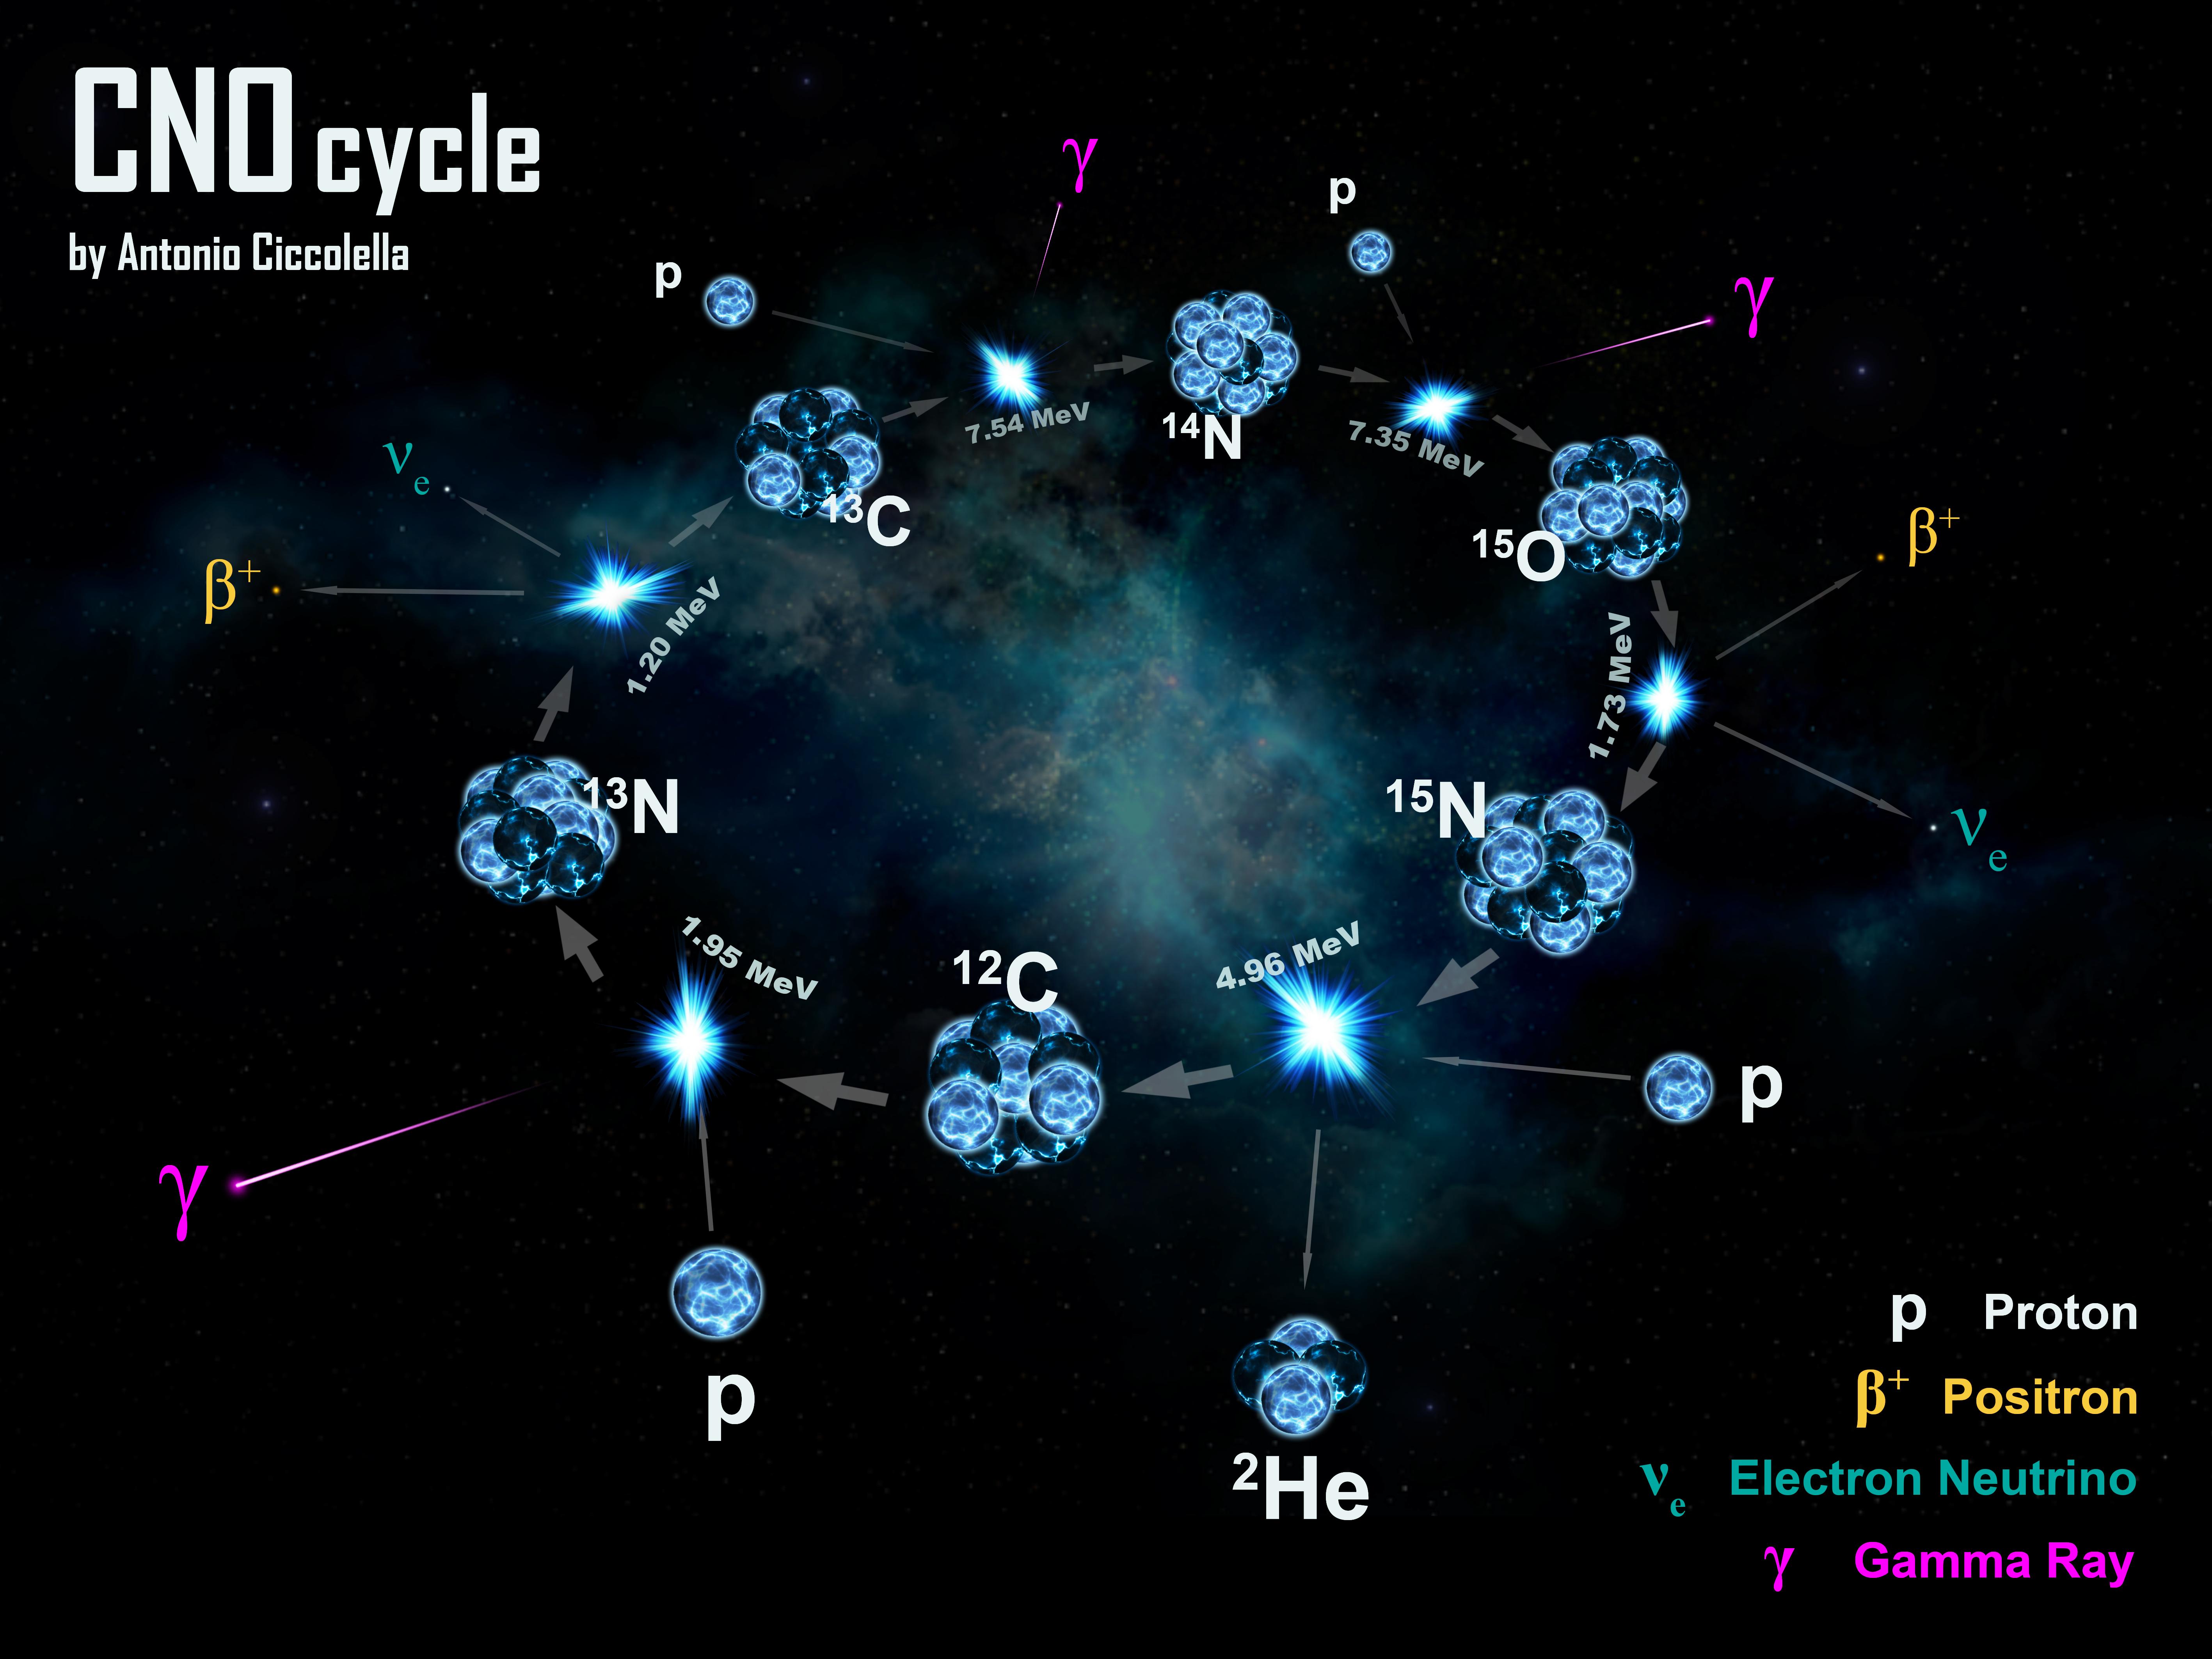 Cno Cycle Wikipedia